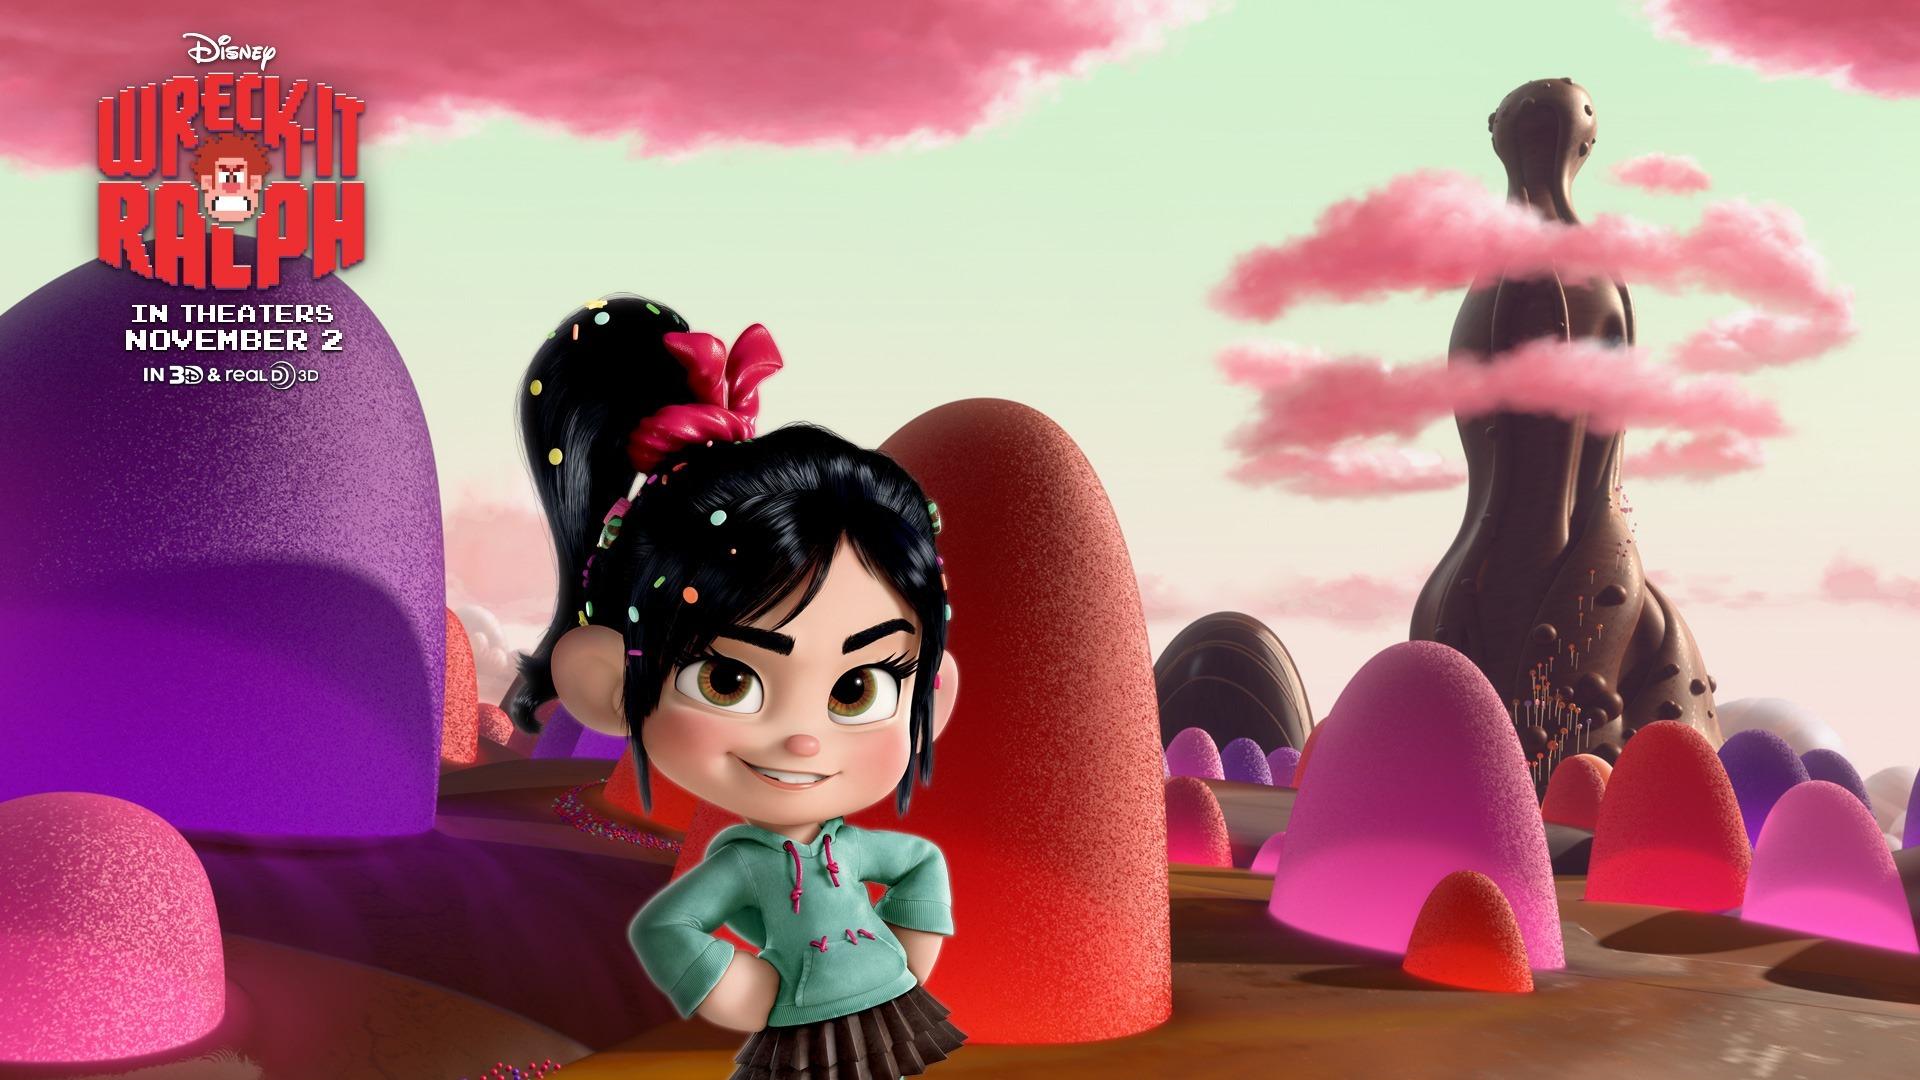 Wreck It Ralph Animation Movie 4k Hd Desktop Wallpaper For: Wreck-It Ralph Movie HD Desktop Wallpapers 19-1920x1080